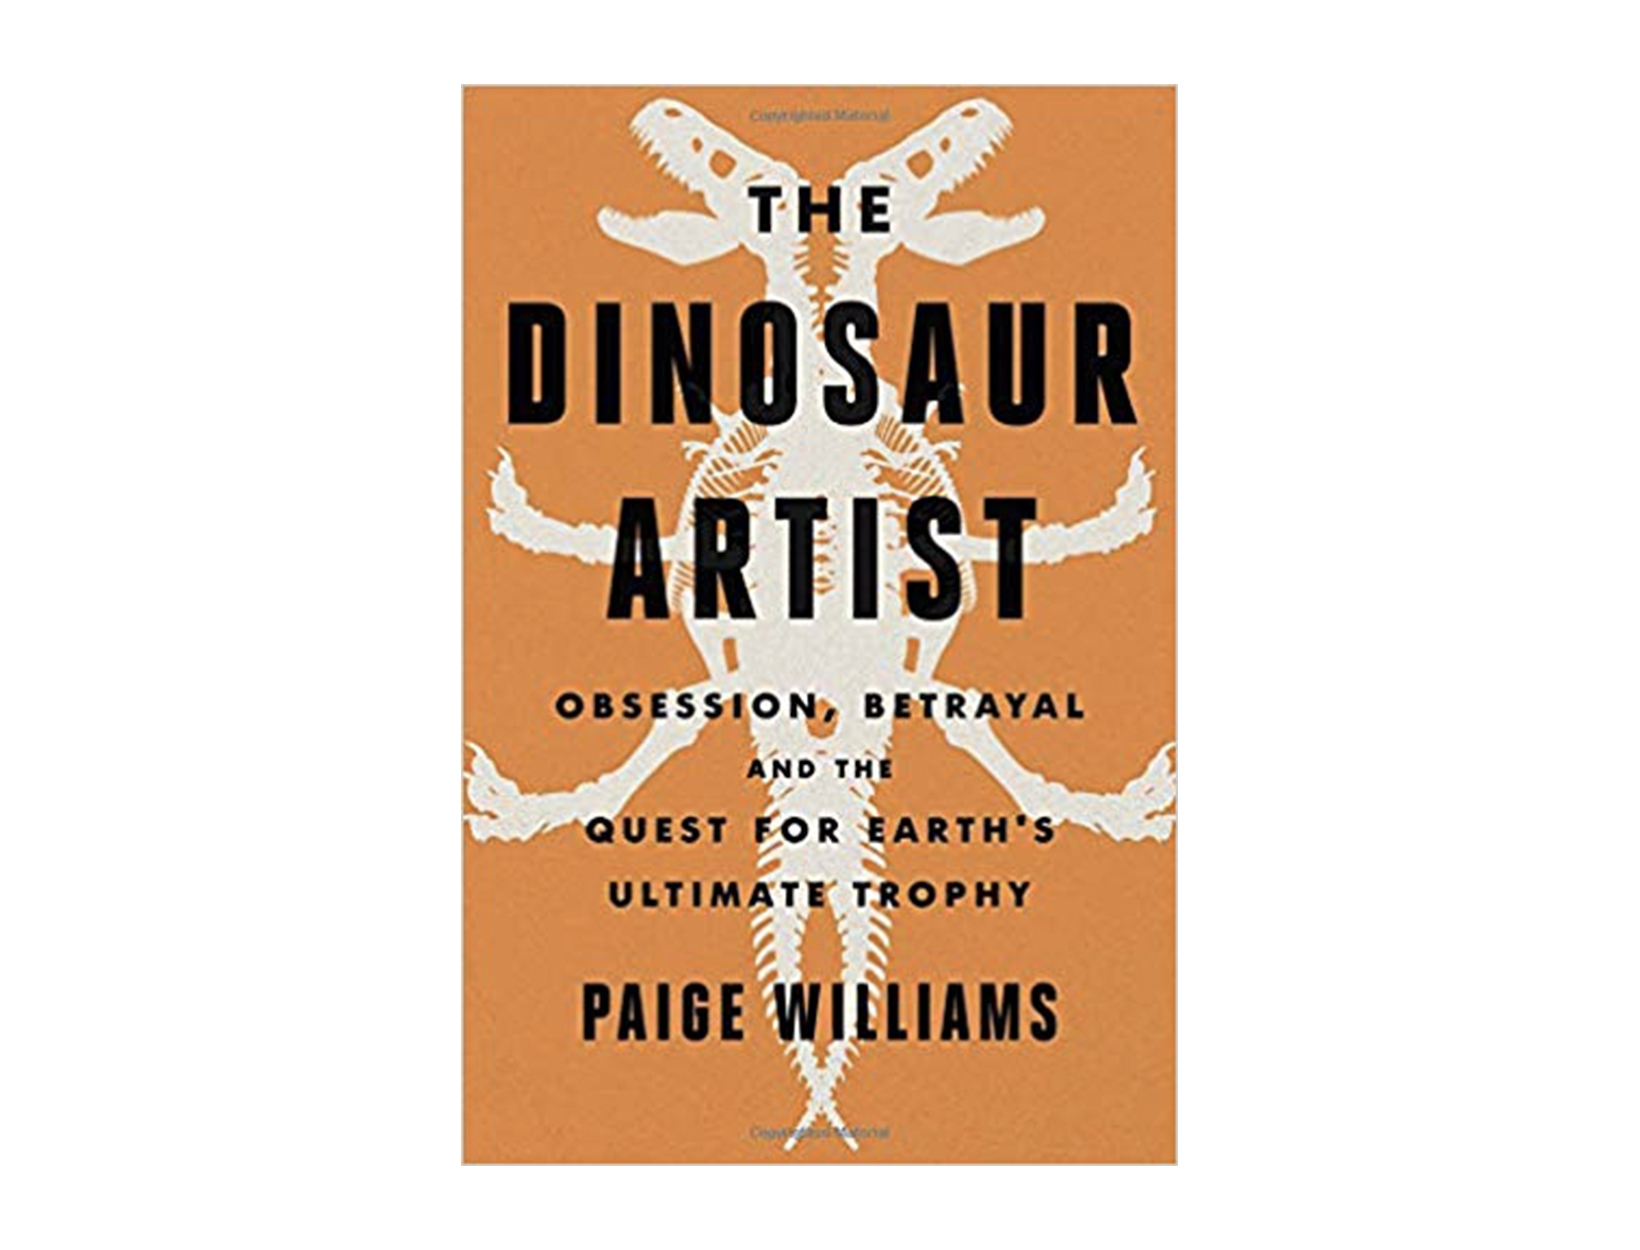 <em>The Dinosaur Artist</em> by Paige Williams